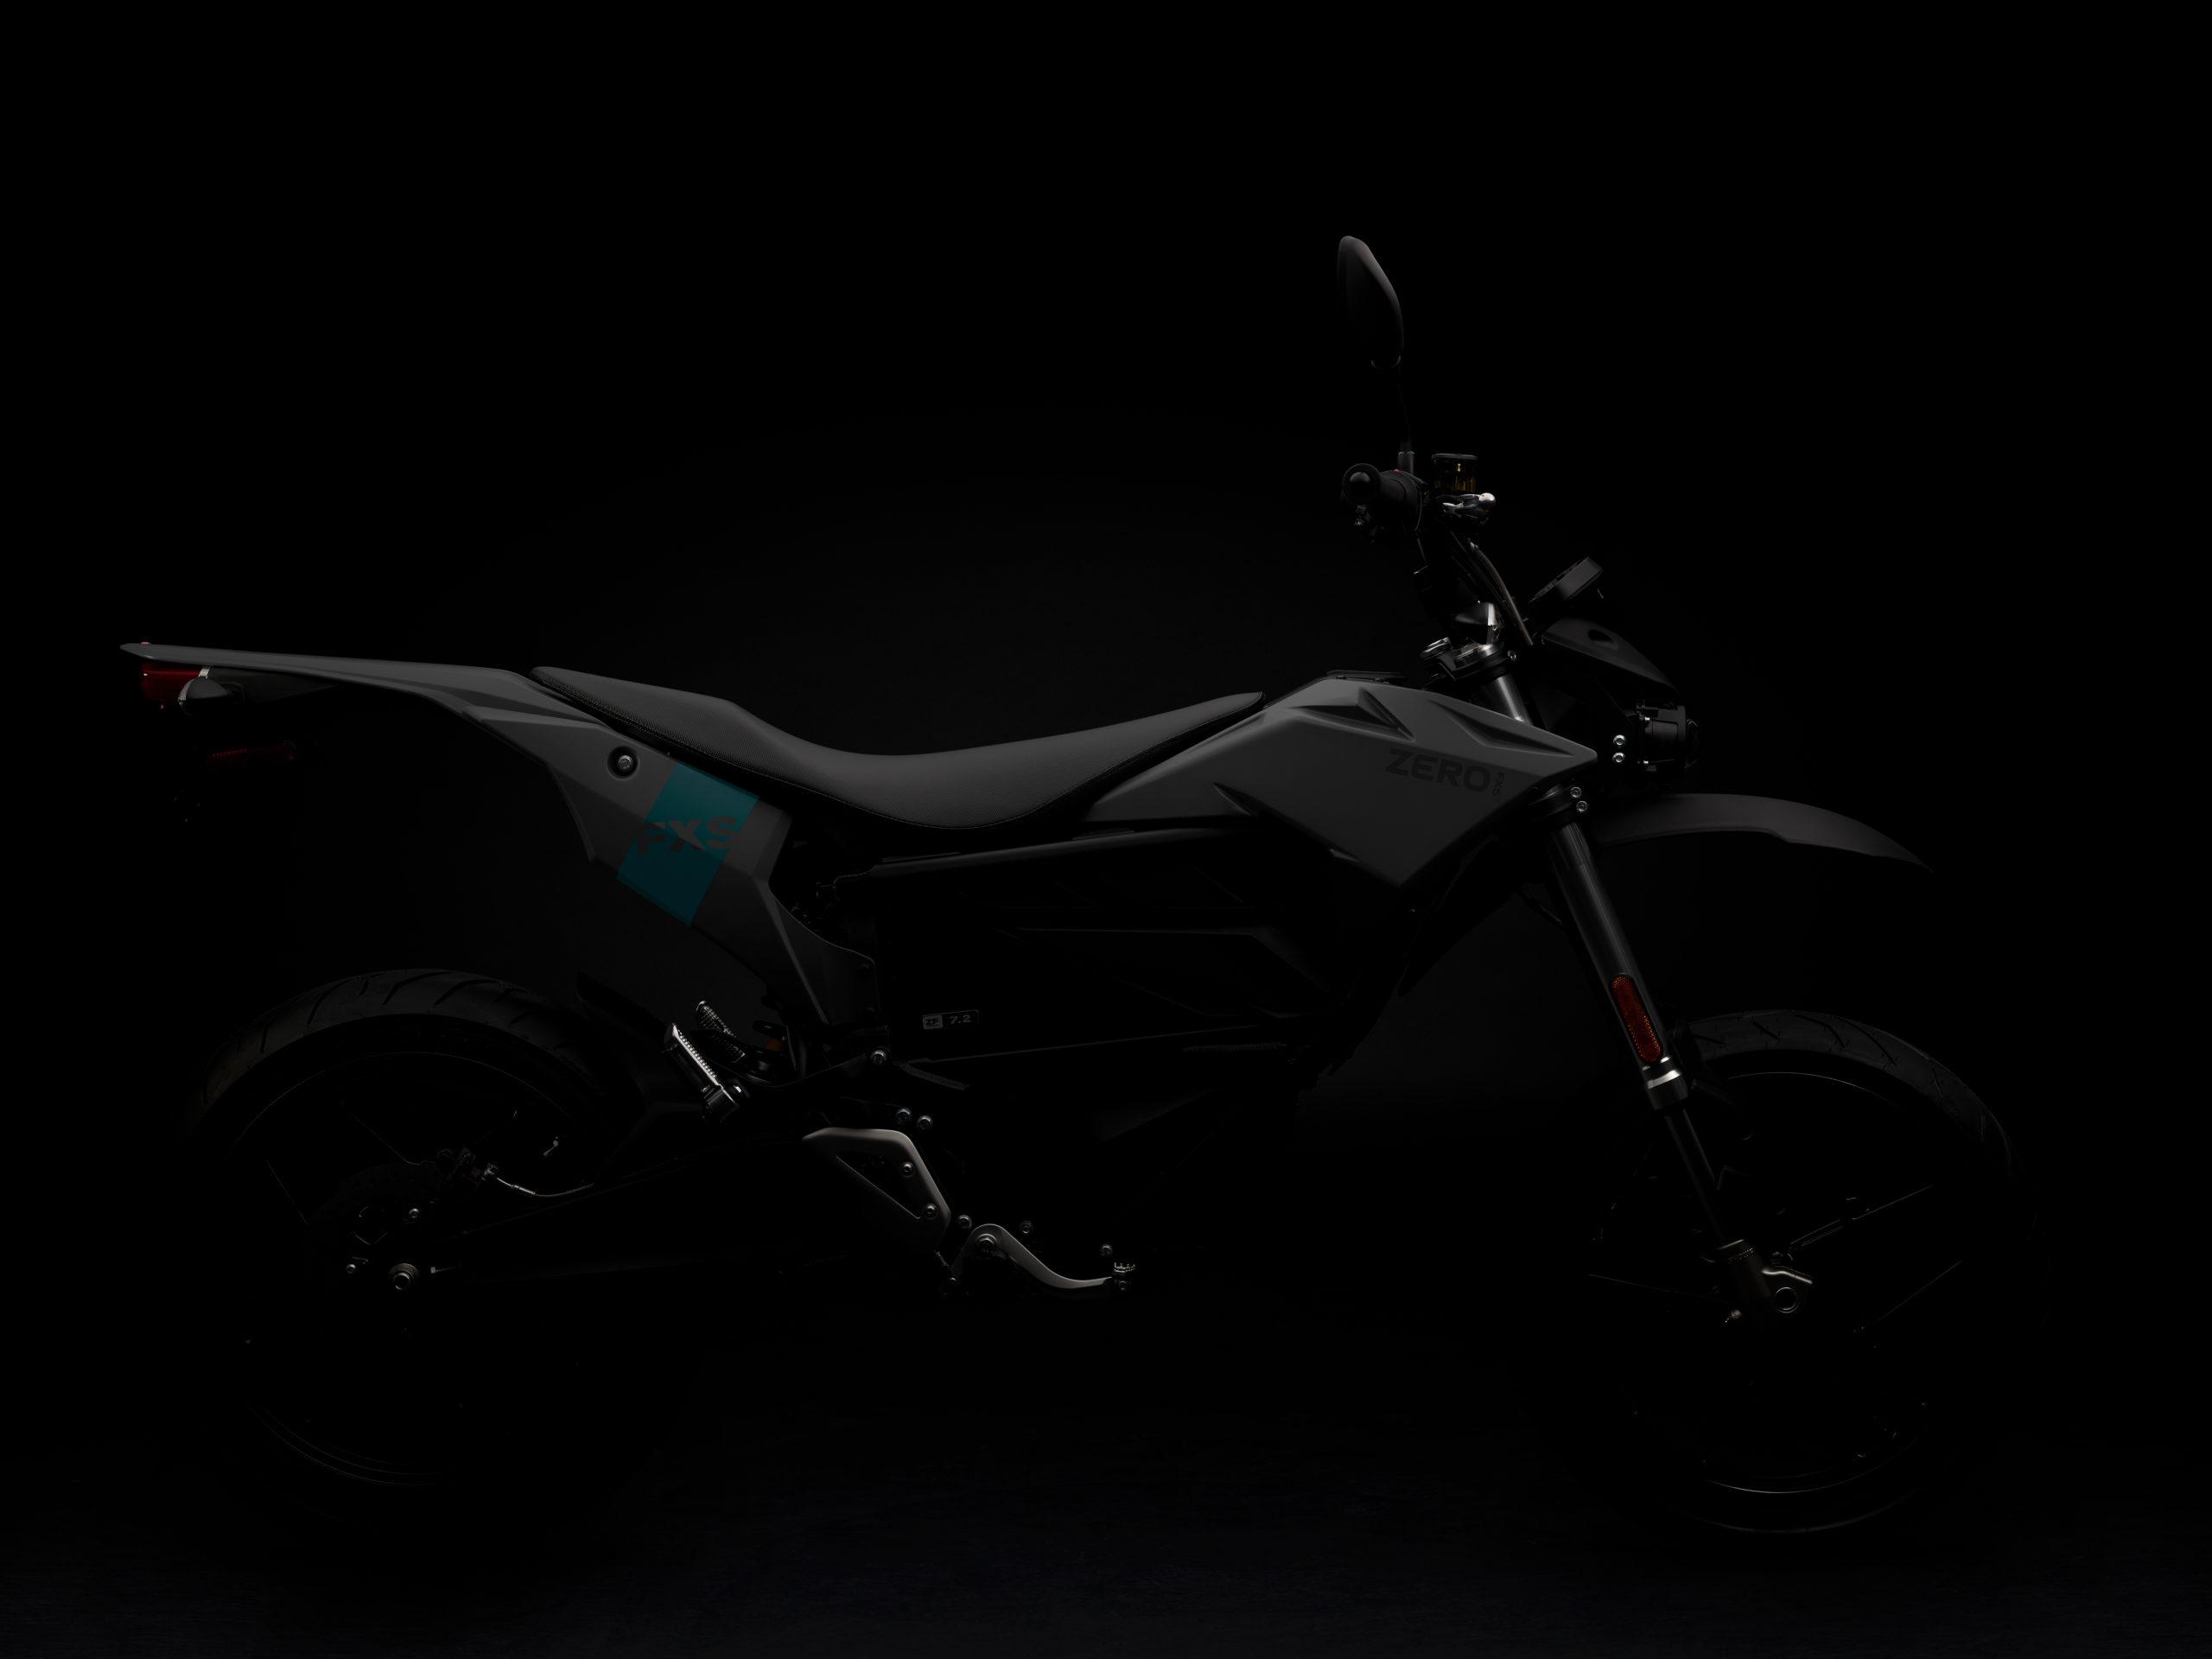 2020_zero-fxs_studio_detail_silhouette